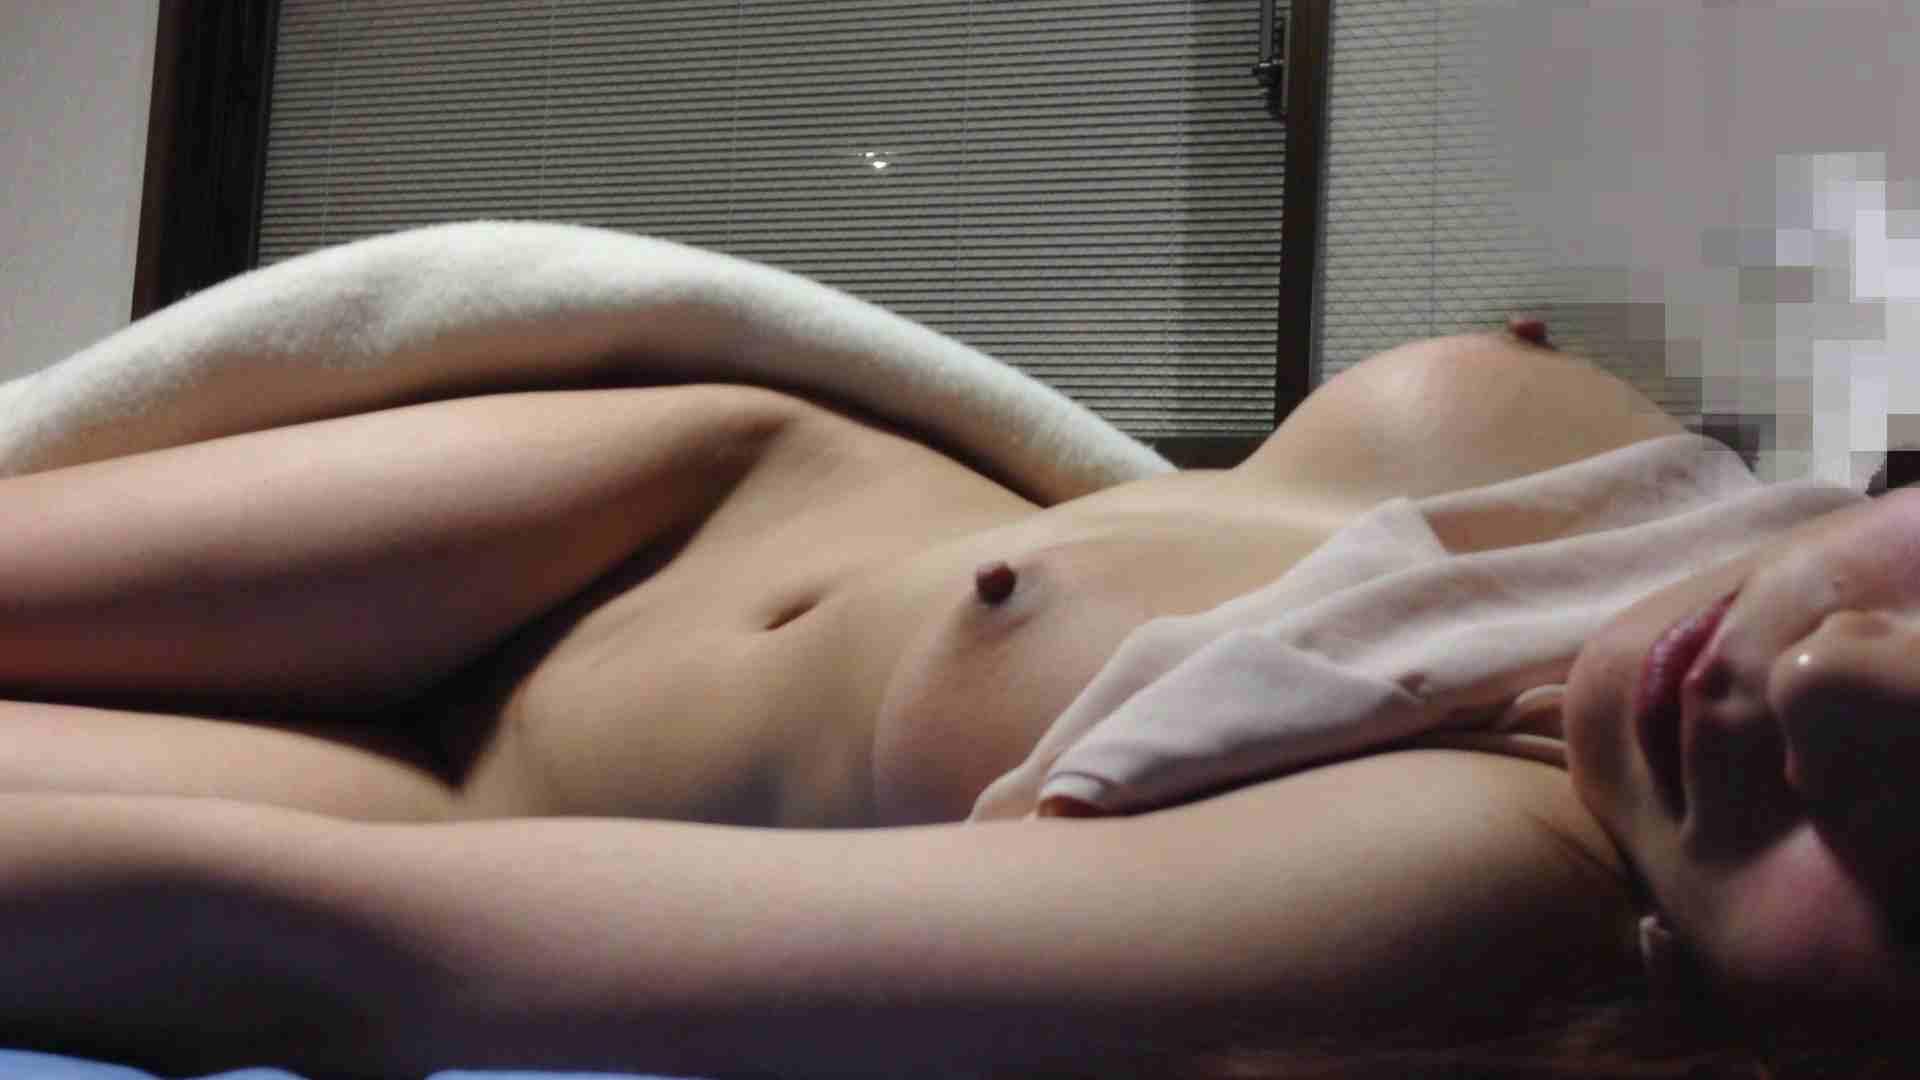 Vol.01 長身スタイル抜群のSSS美女を・・・。 前編 美女まとめ オメコ無修正動画無料 86PIX 74